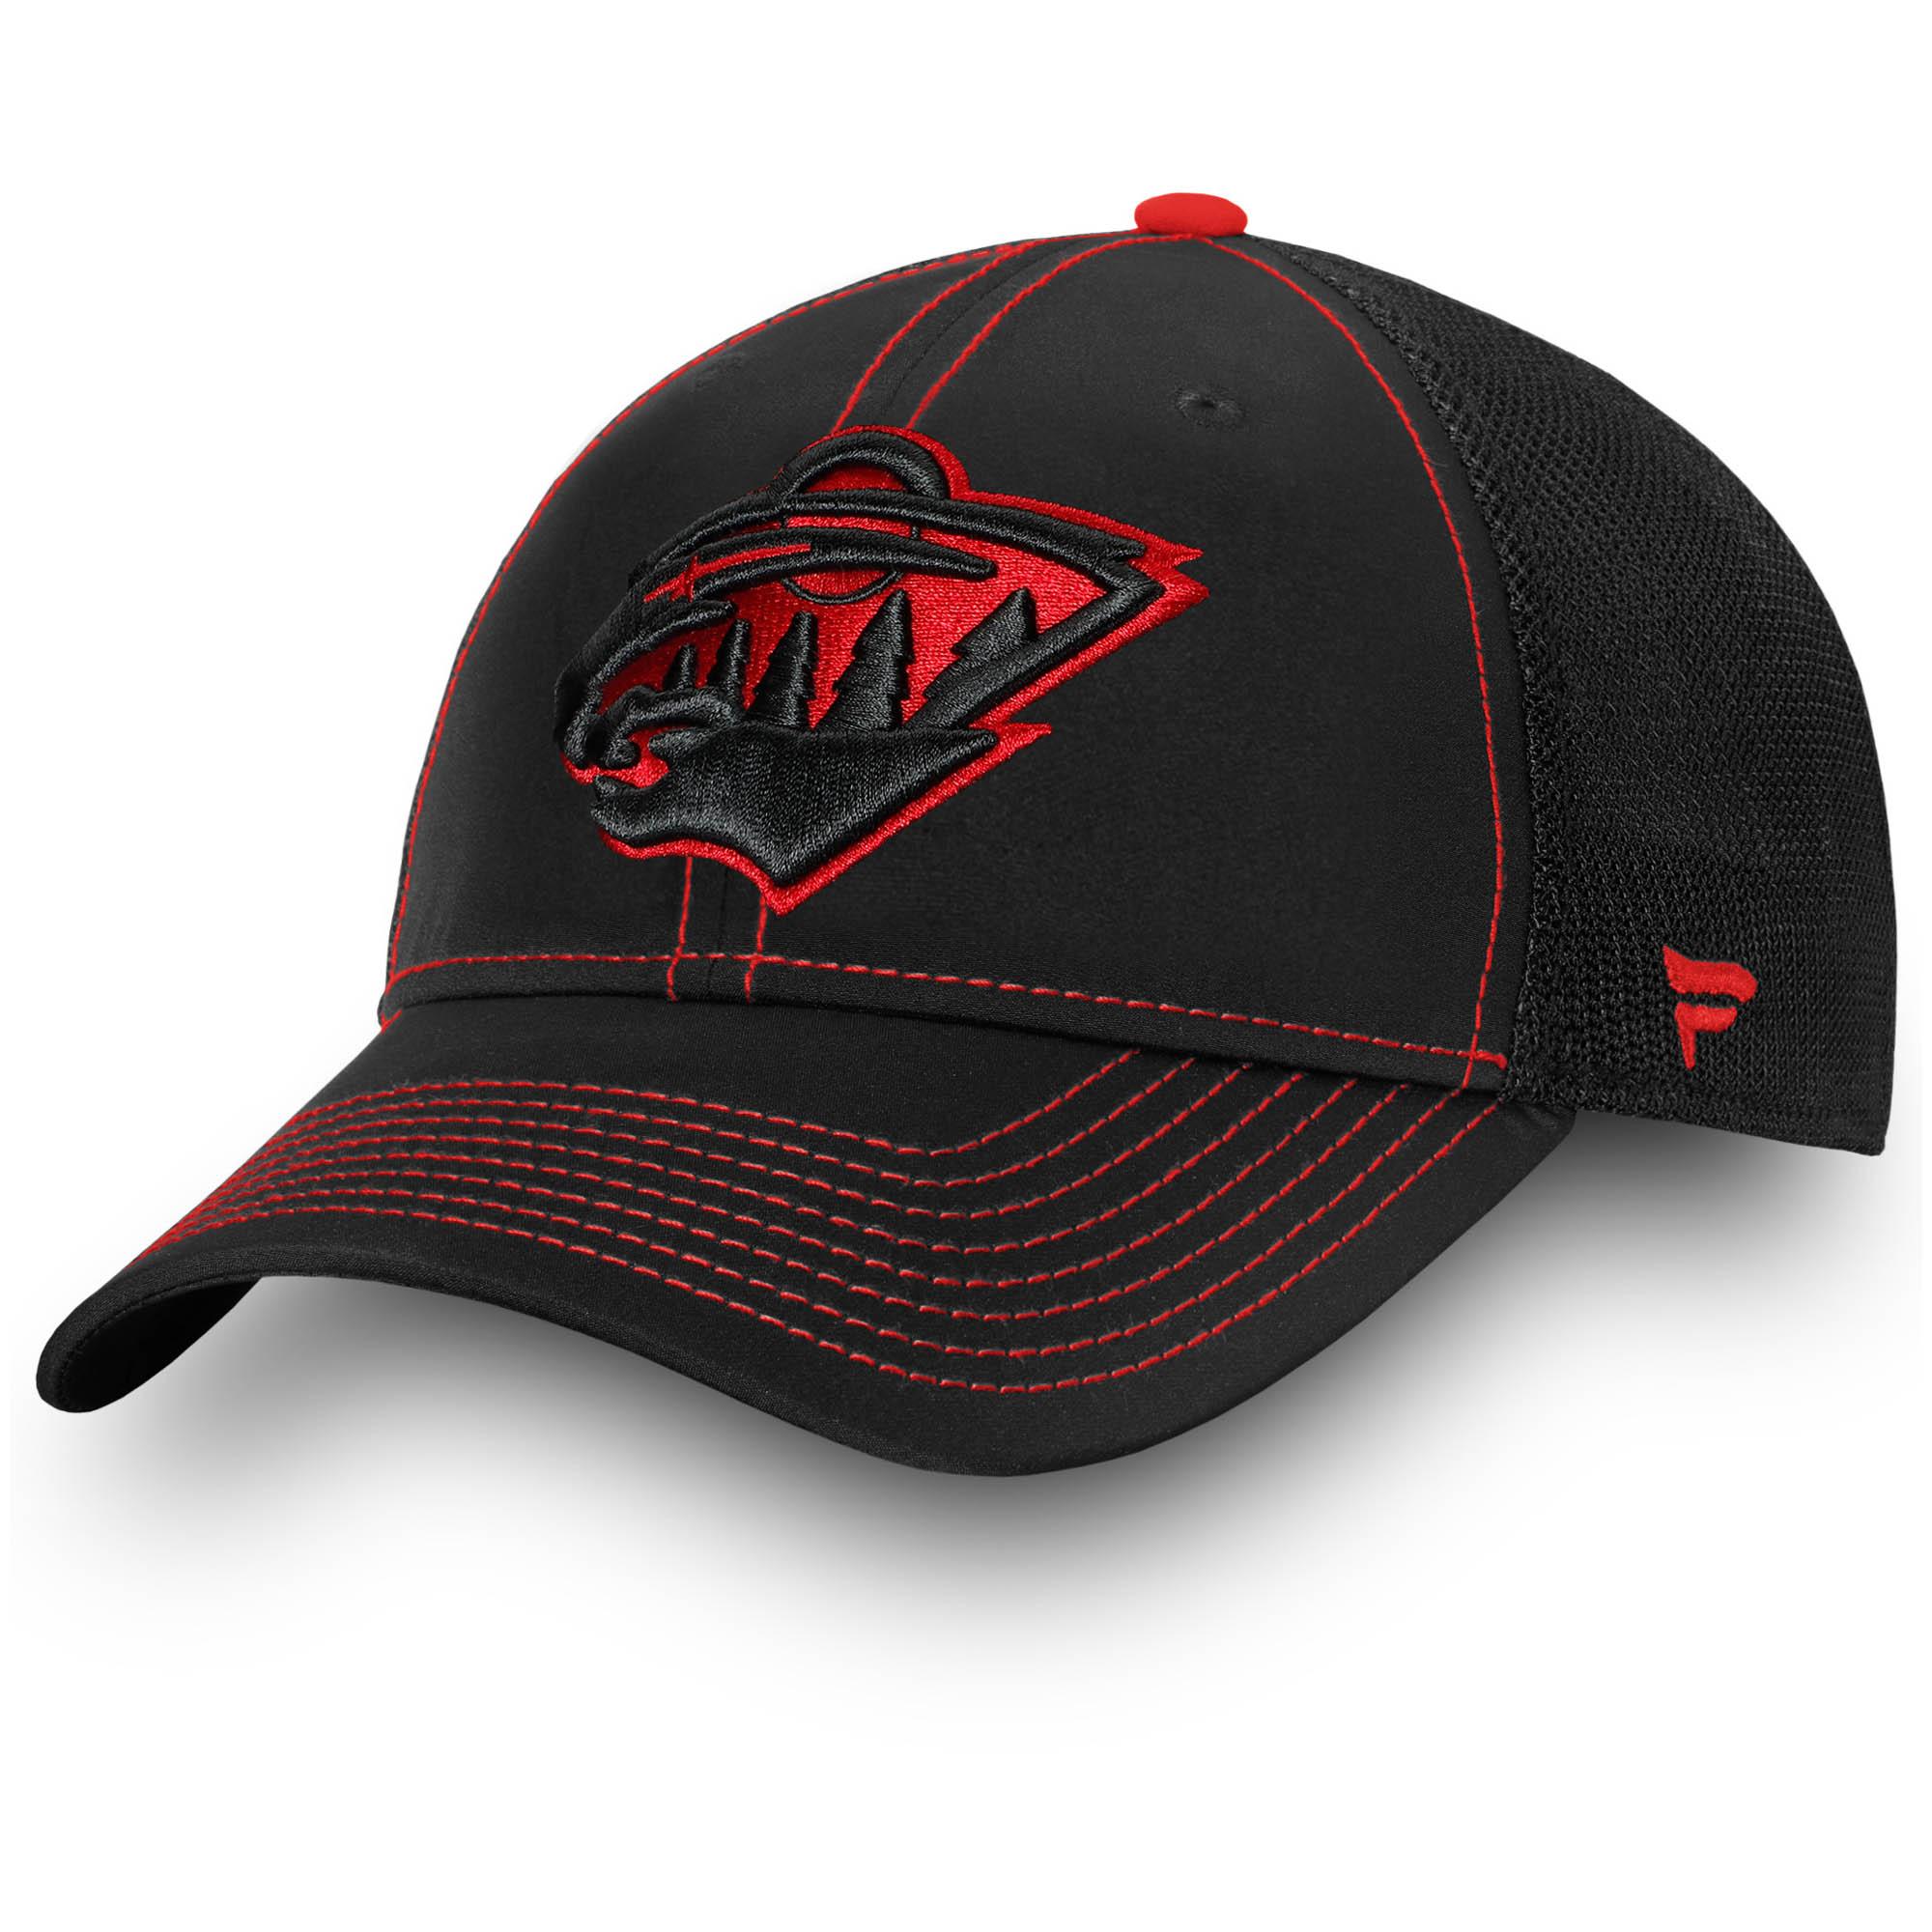 Minnesota Wild Fanatics Branded Iconic Agile Flex Hat - Black